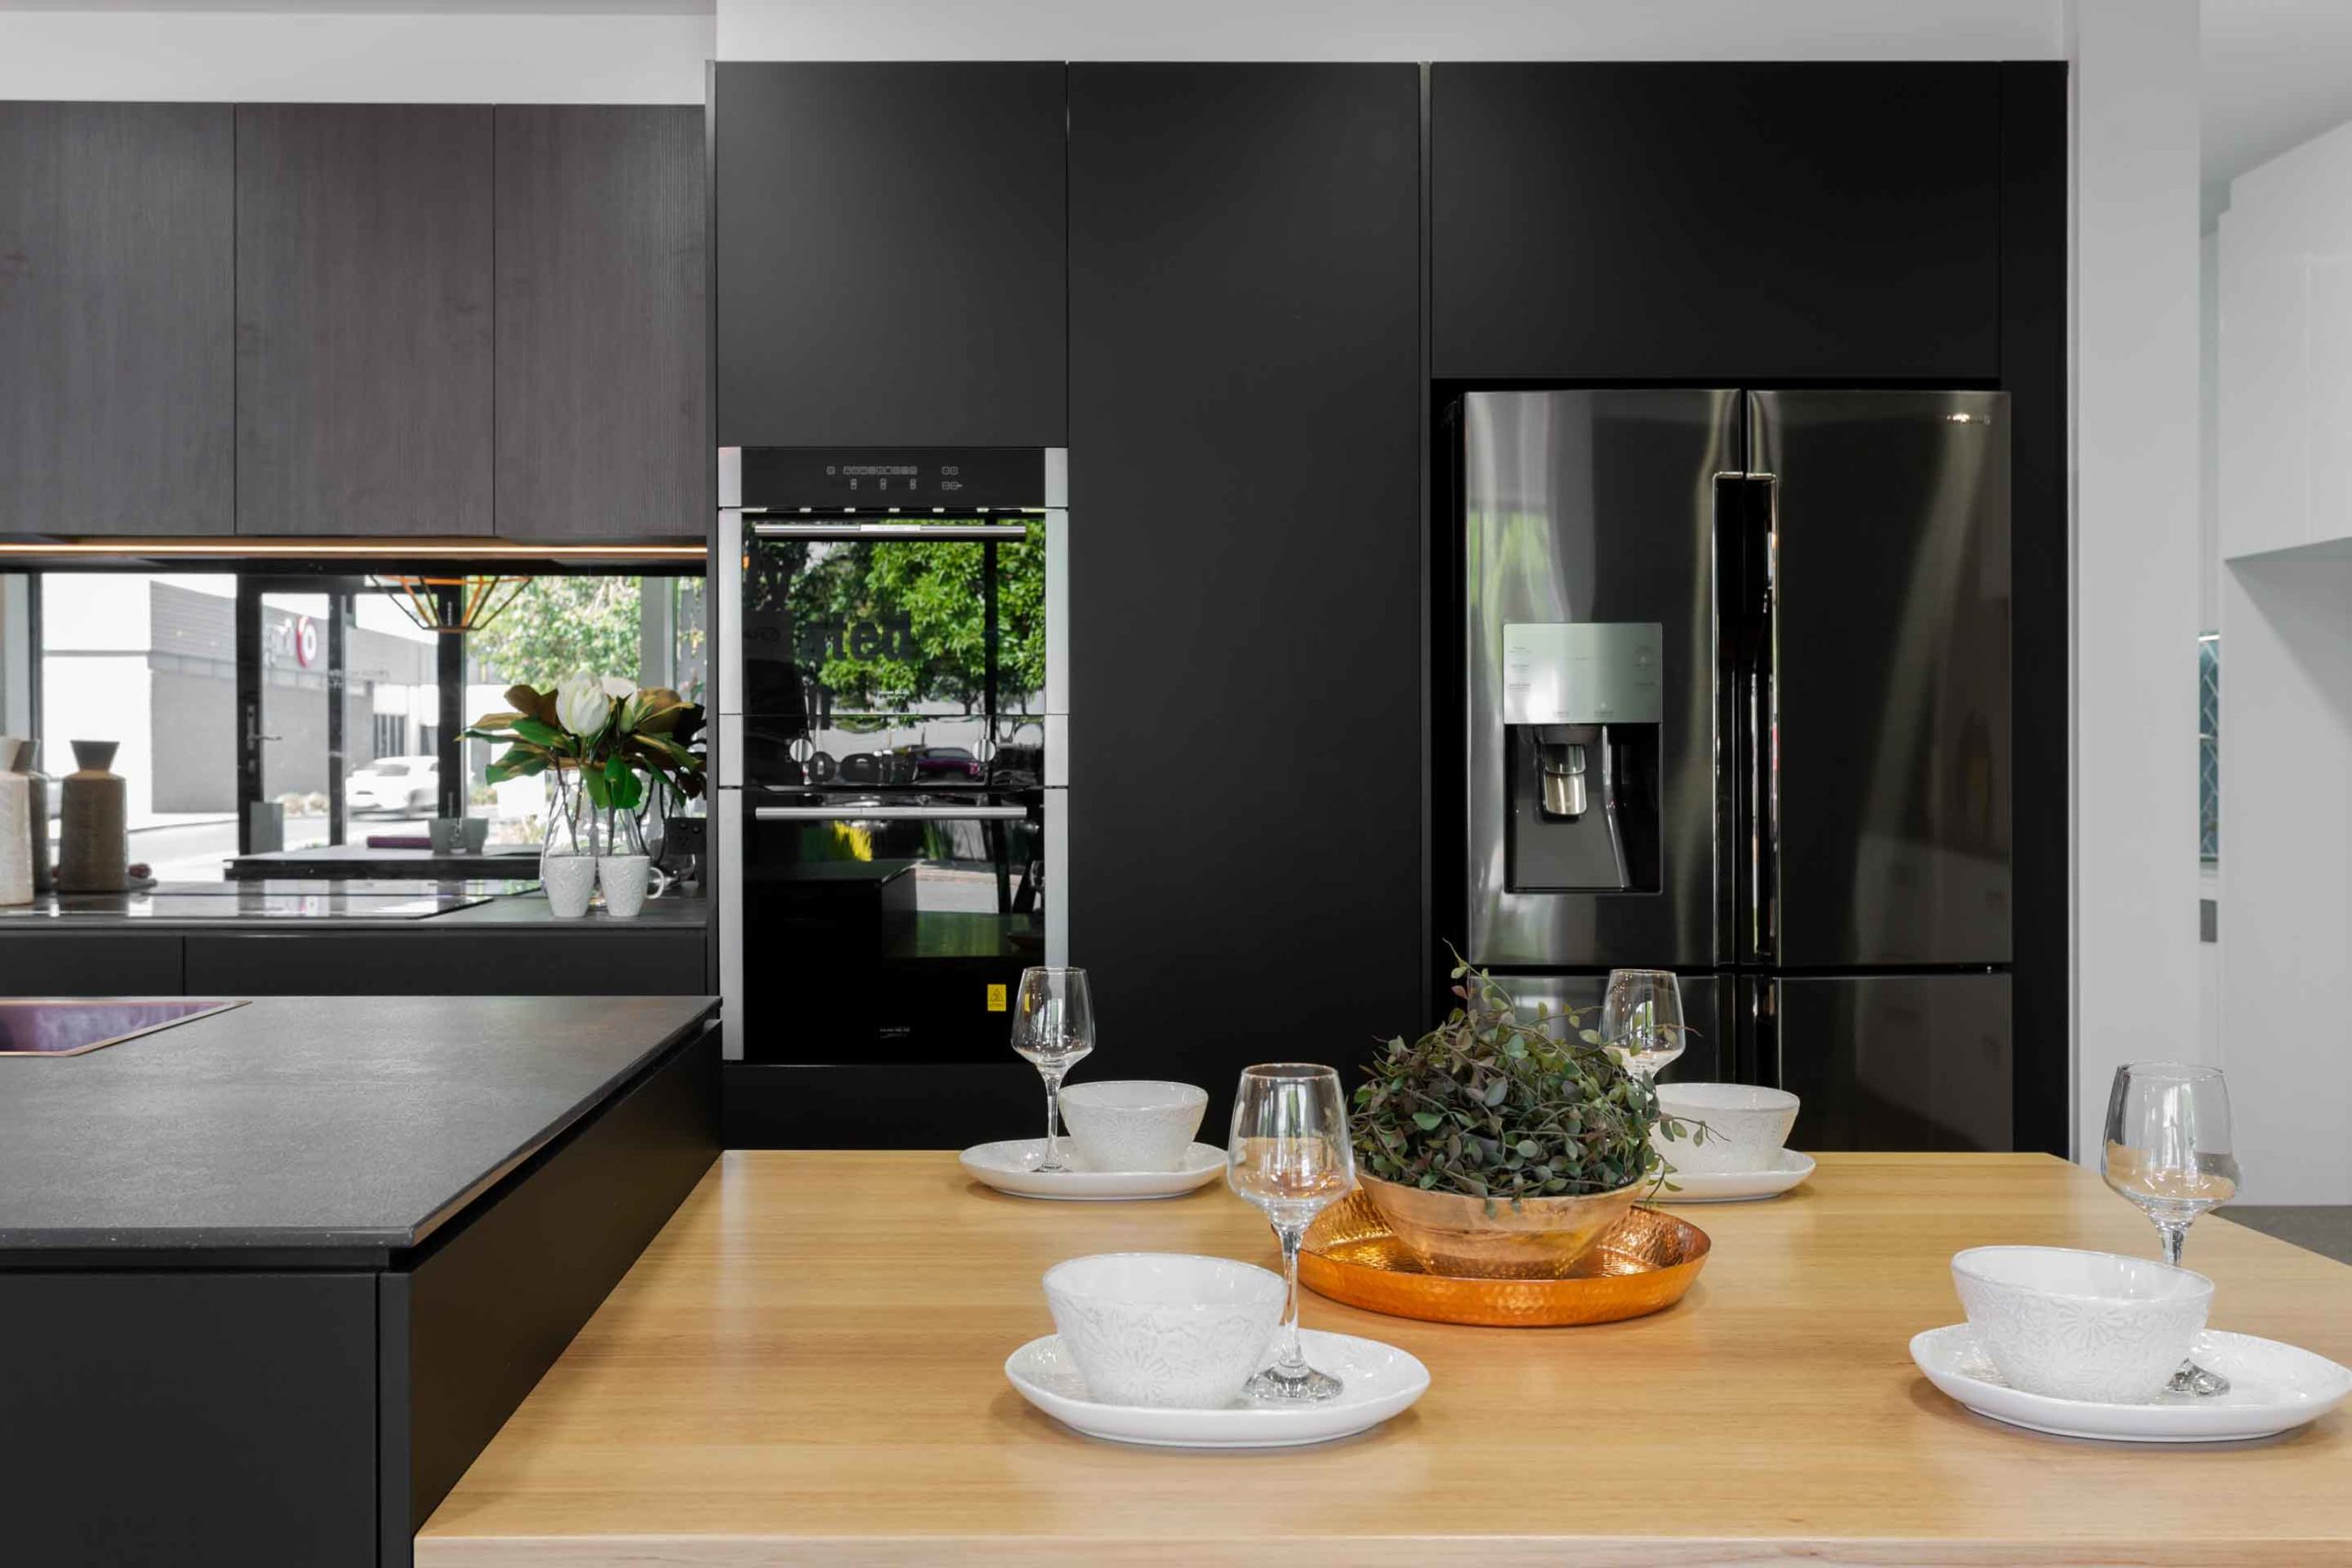 Leopard_Lens_Photography_Inarc_Design_Simson_Kitchen_Showroom-53